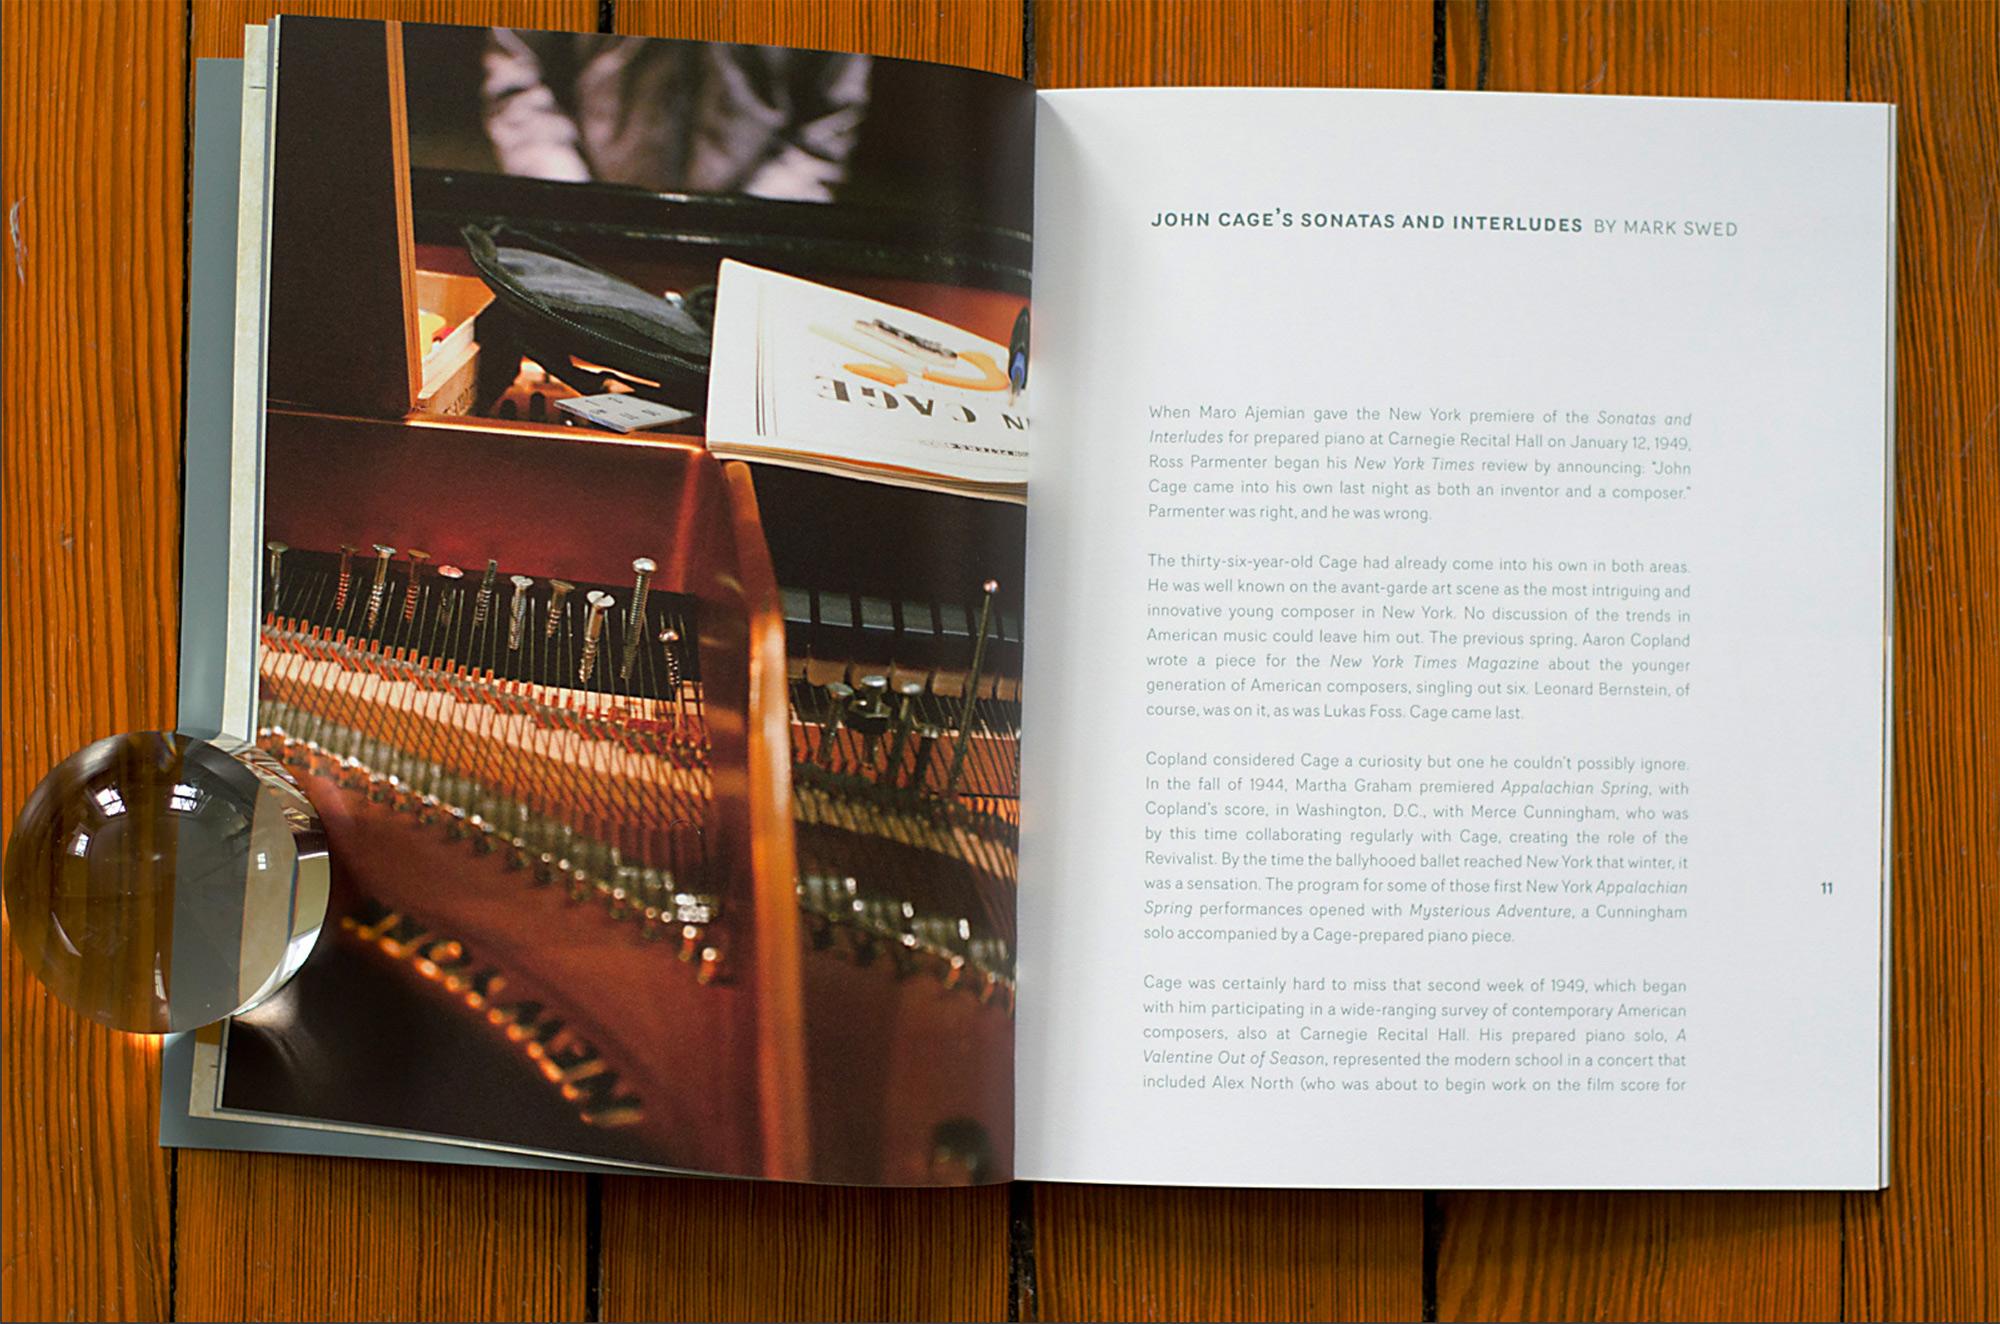 John Cage Sonatas and Interludes 3 lp box set